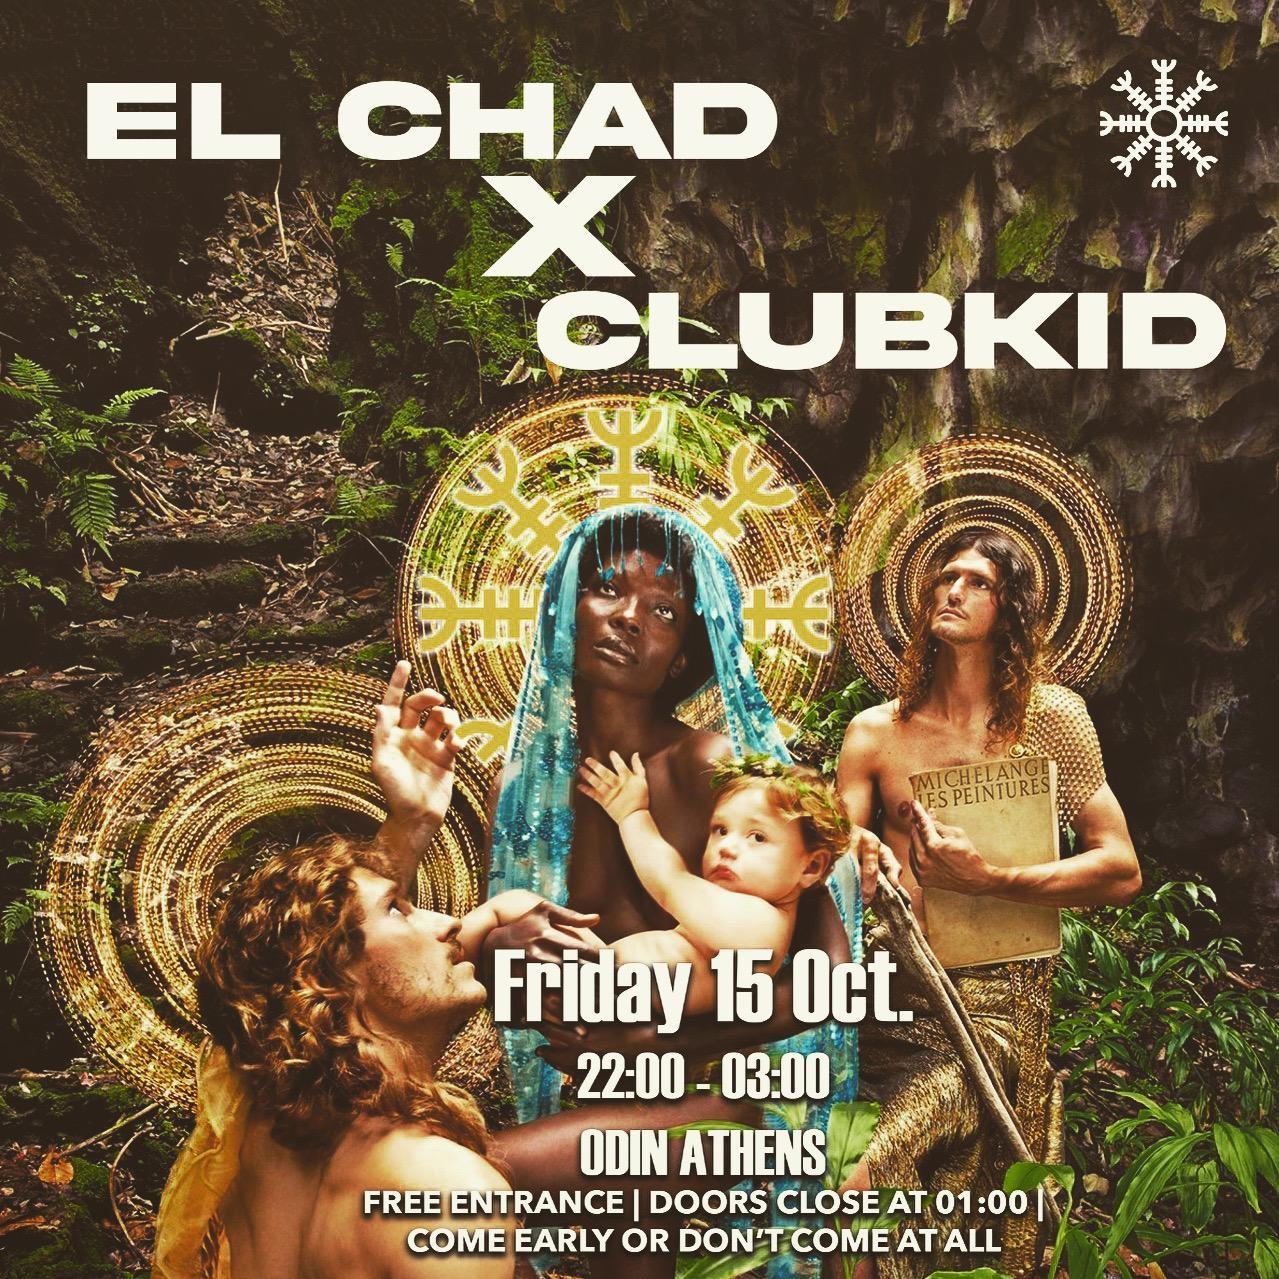 ClubKid x el Chad - Flyer front